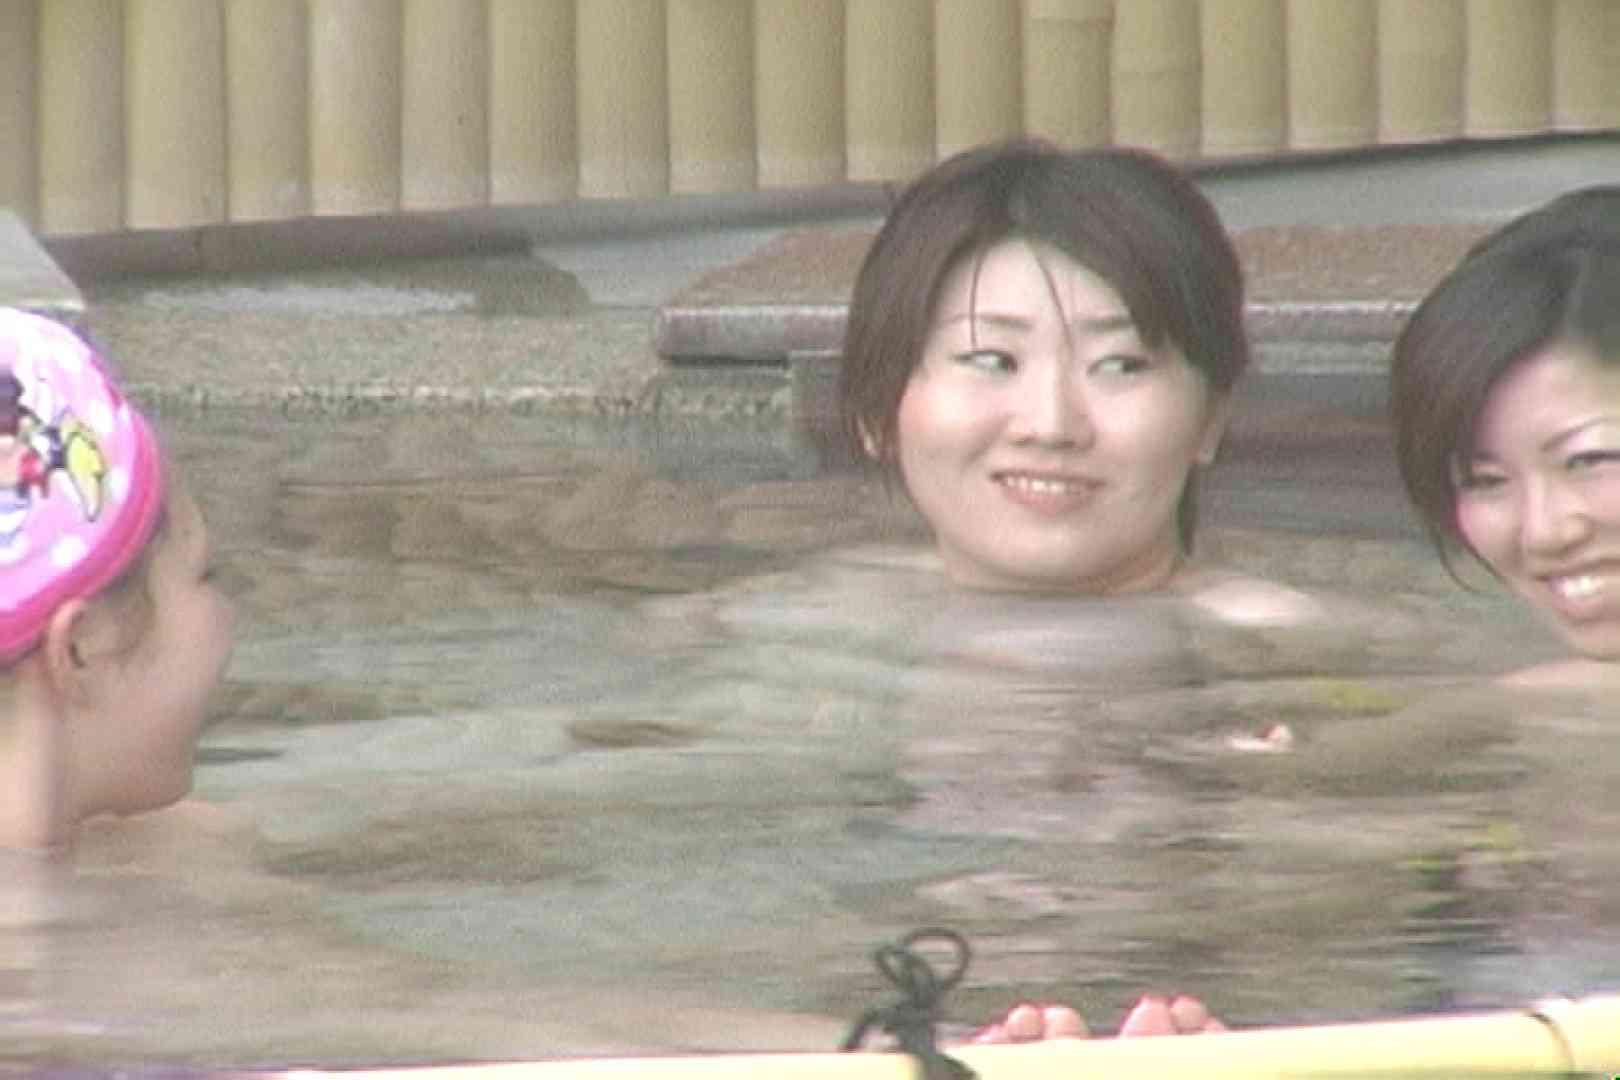 Aquaな露天風呂Vol.25 露天風呂編  91PIX 90